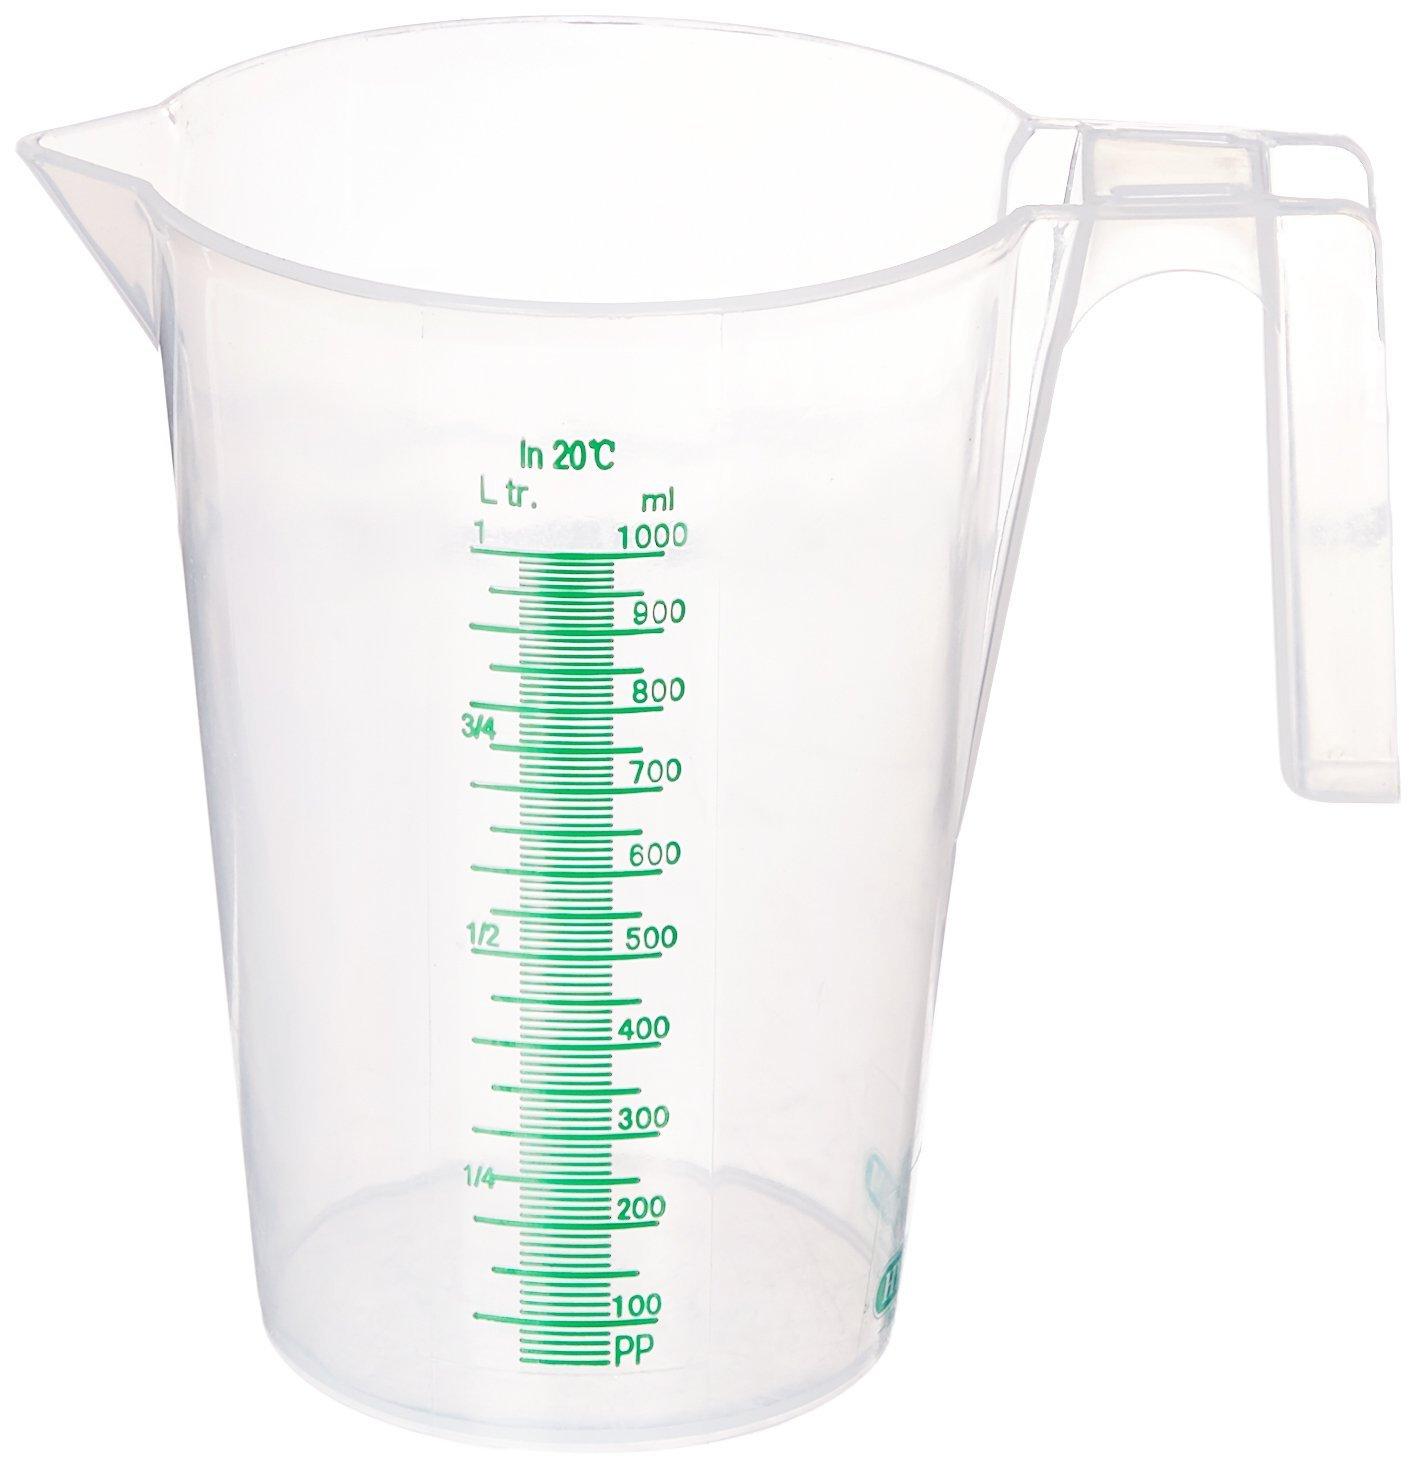 Hydrofarm Hgmc1000 Measuring Cup 1000ml